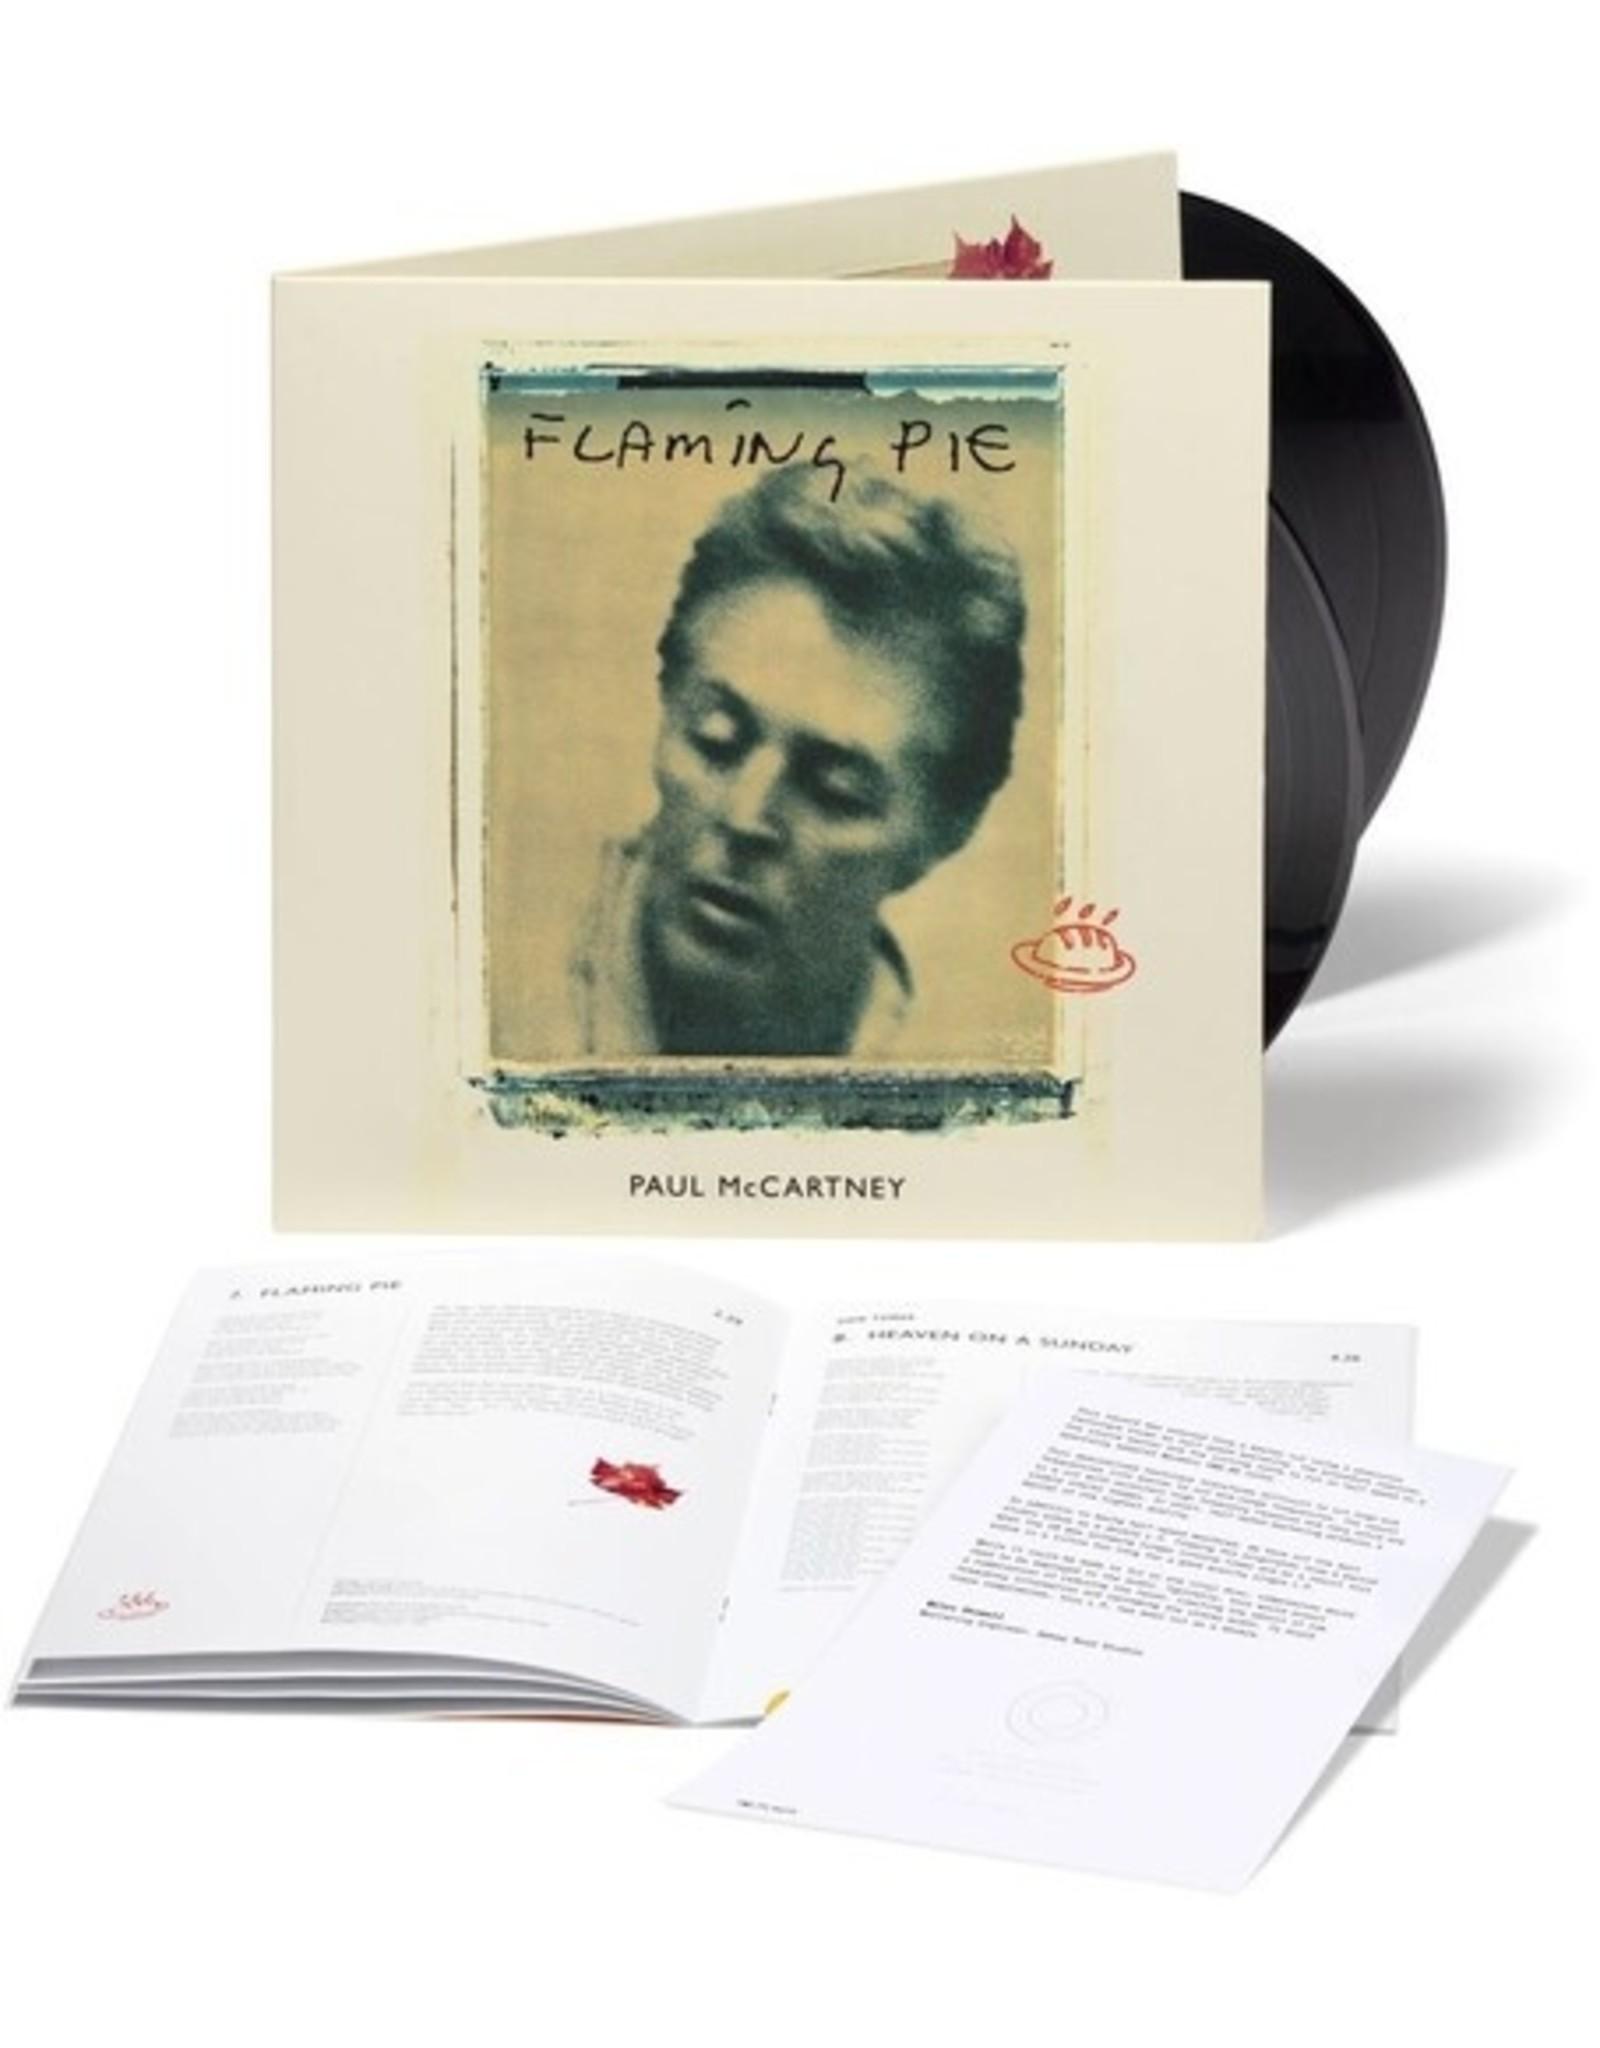 New Vinyl Paul McCartney - Flaming Pie 2LP